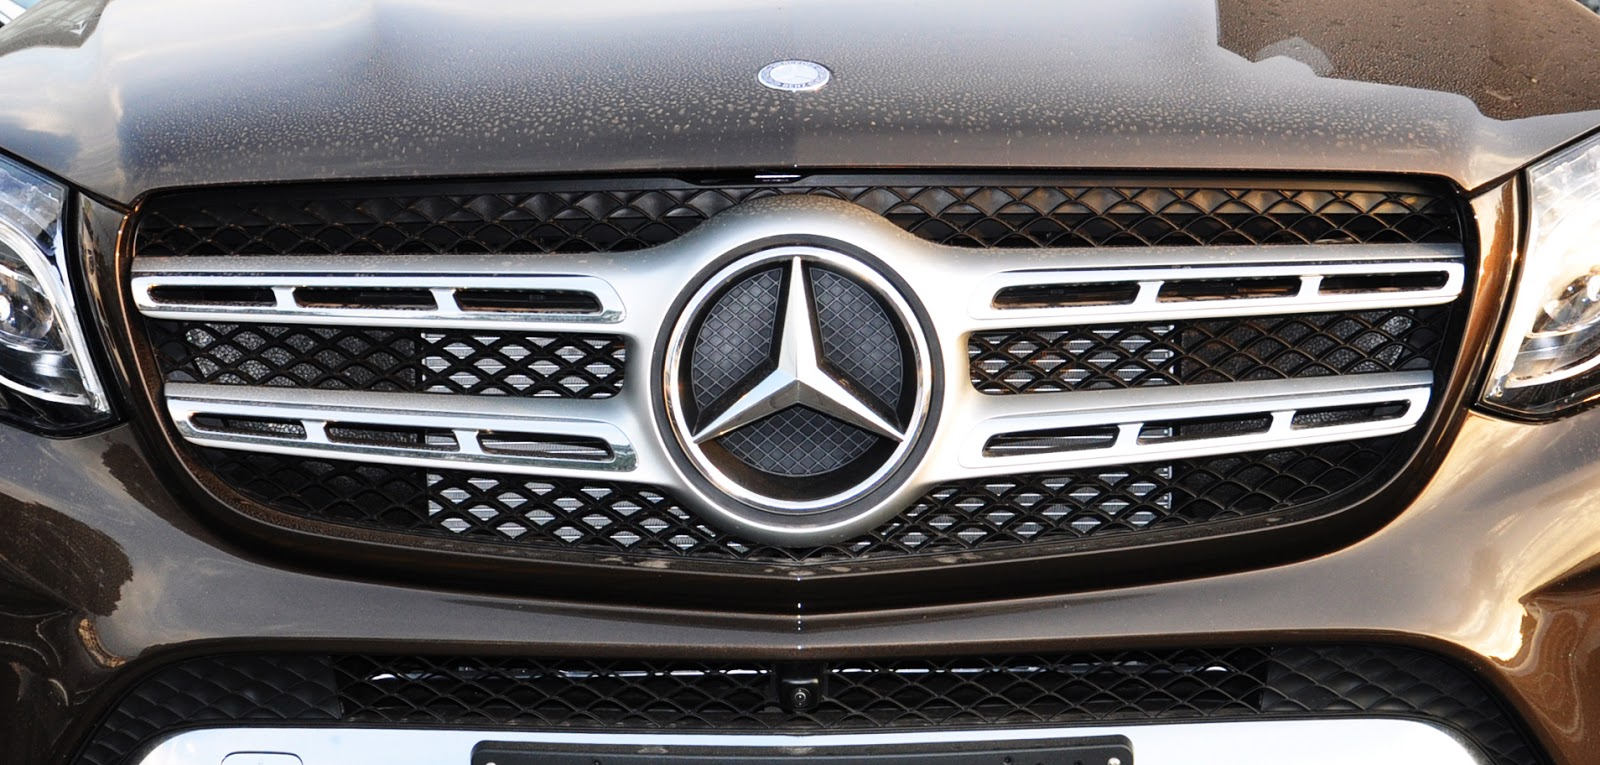 xe Mercedes Benz GLS 400 thế hệ mới 03